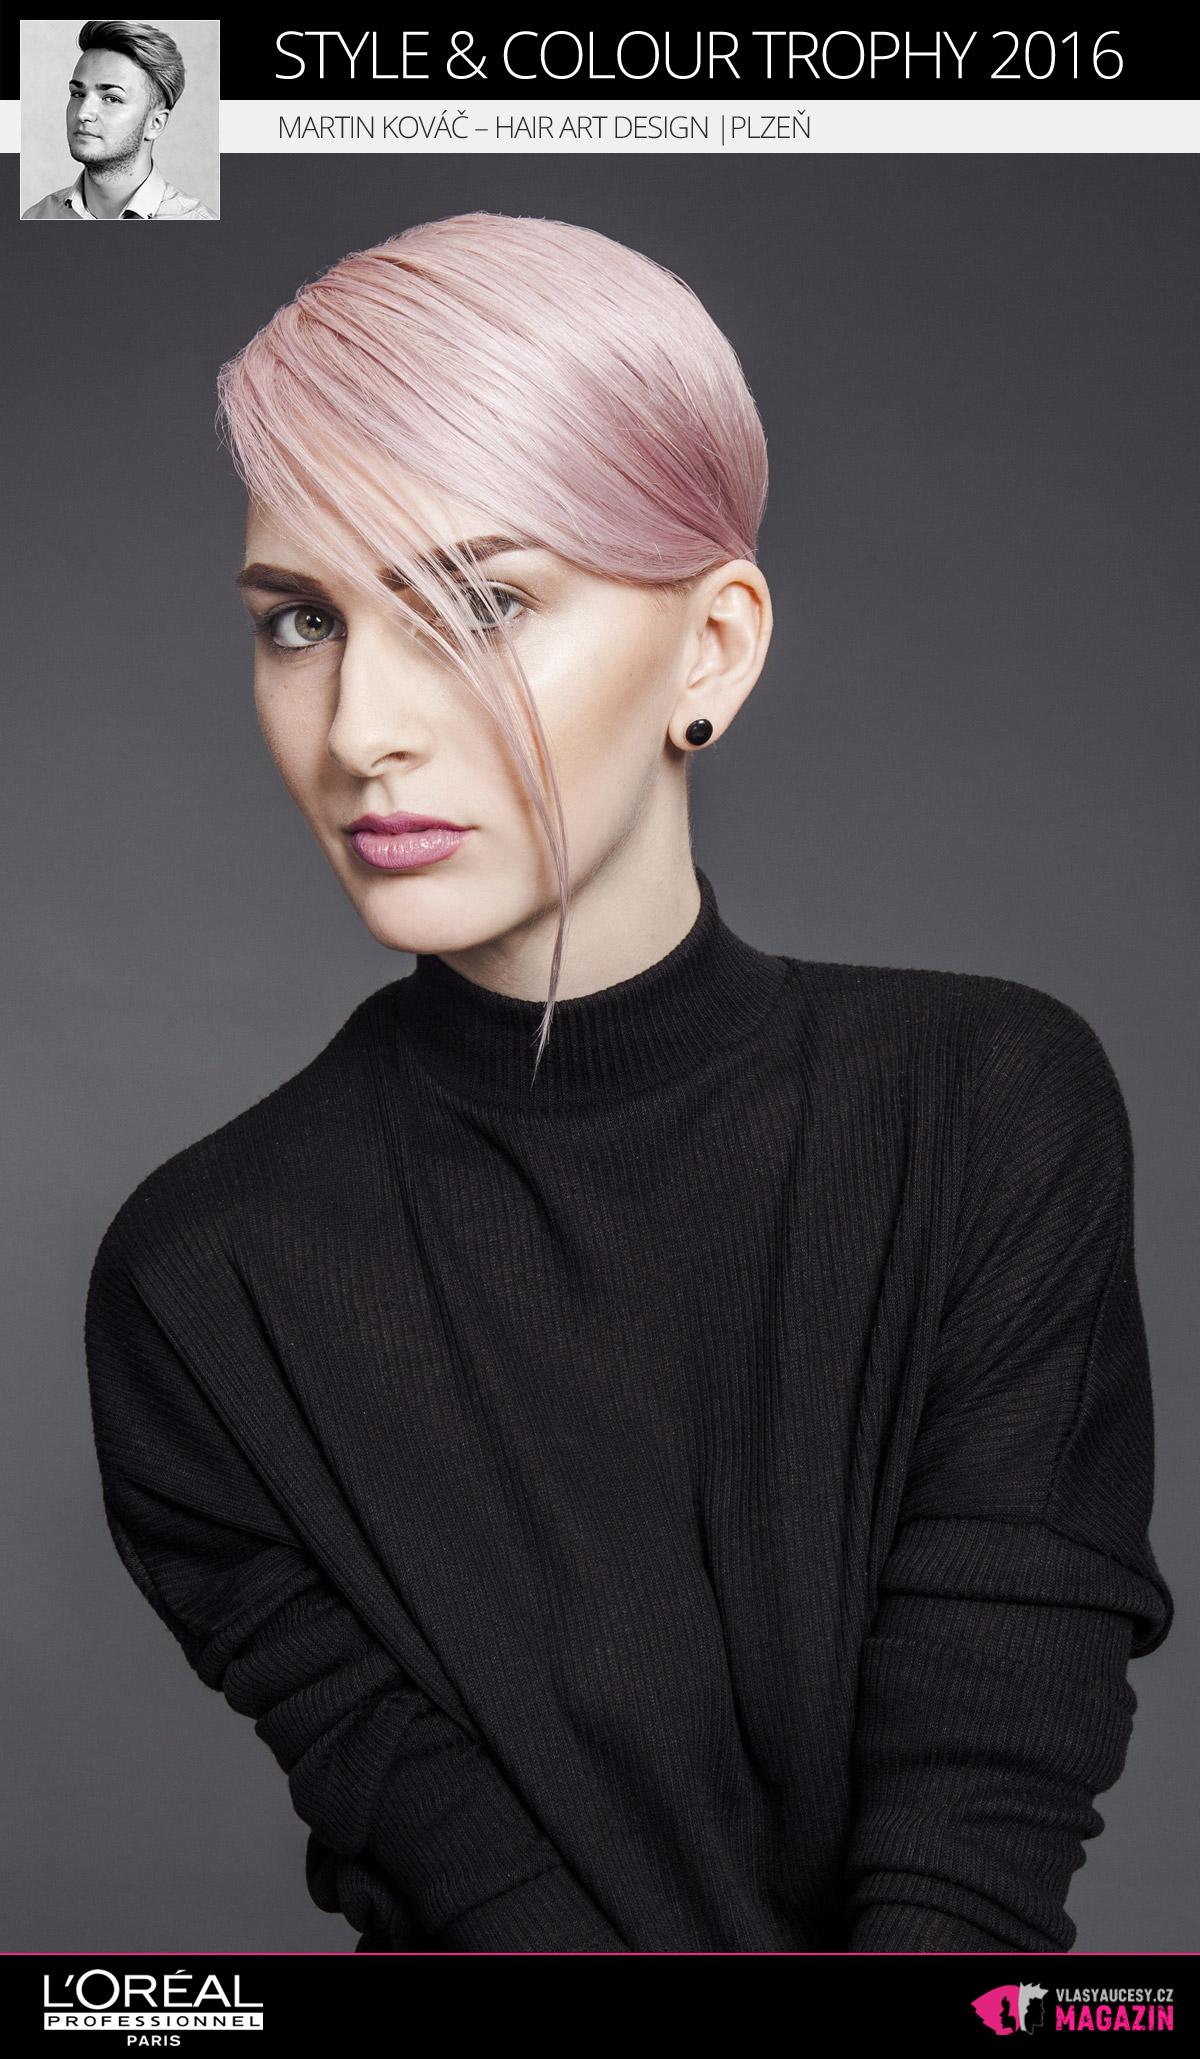 Martin Kováč – Hair Art Design, Plzeň   L'Oréal Style & Colour Trophy 2016